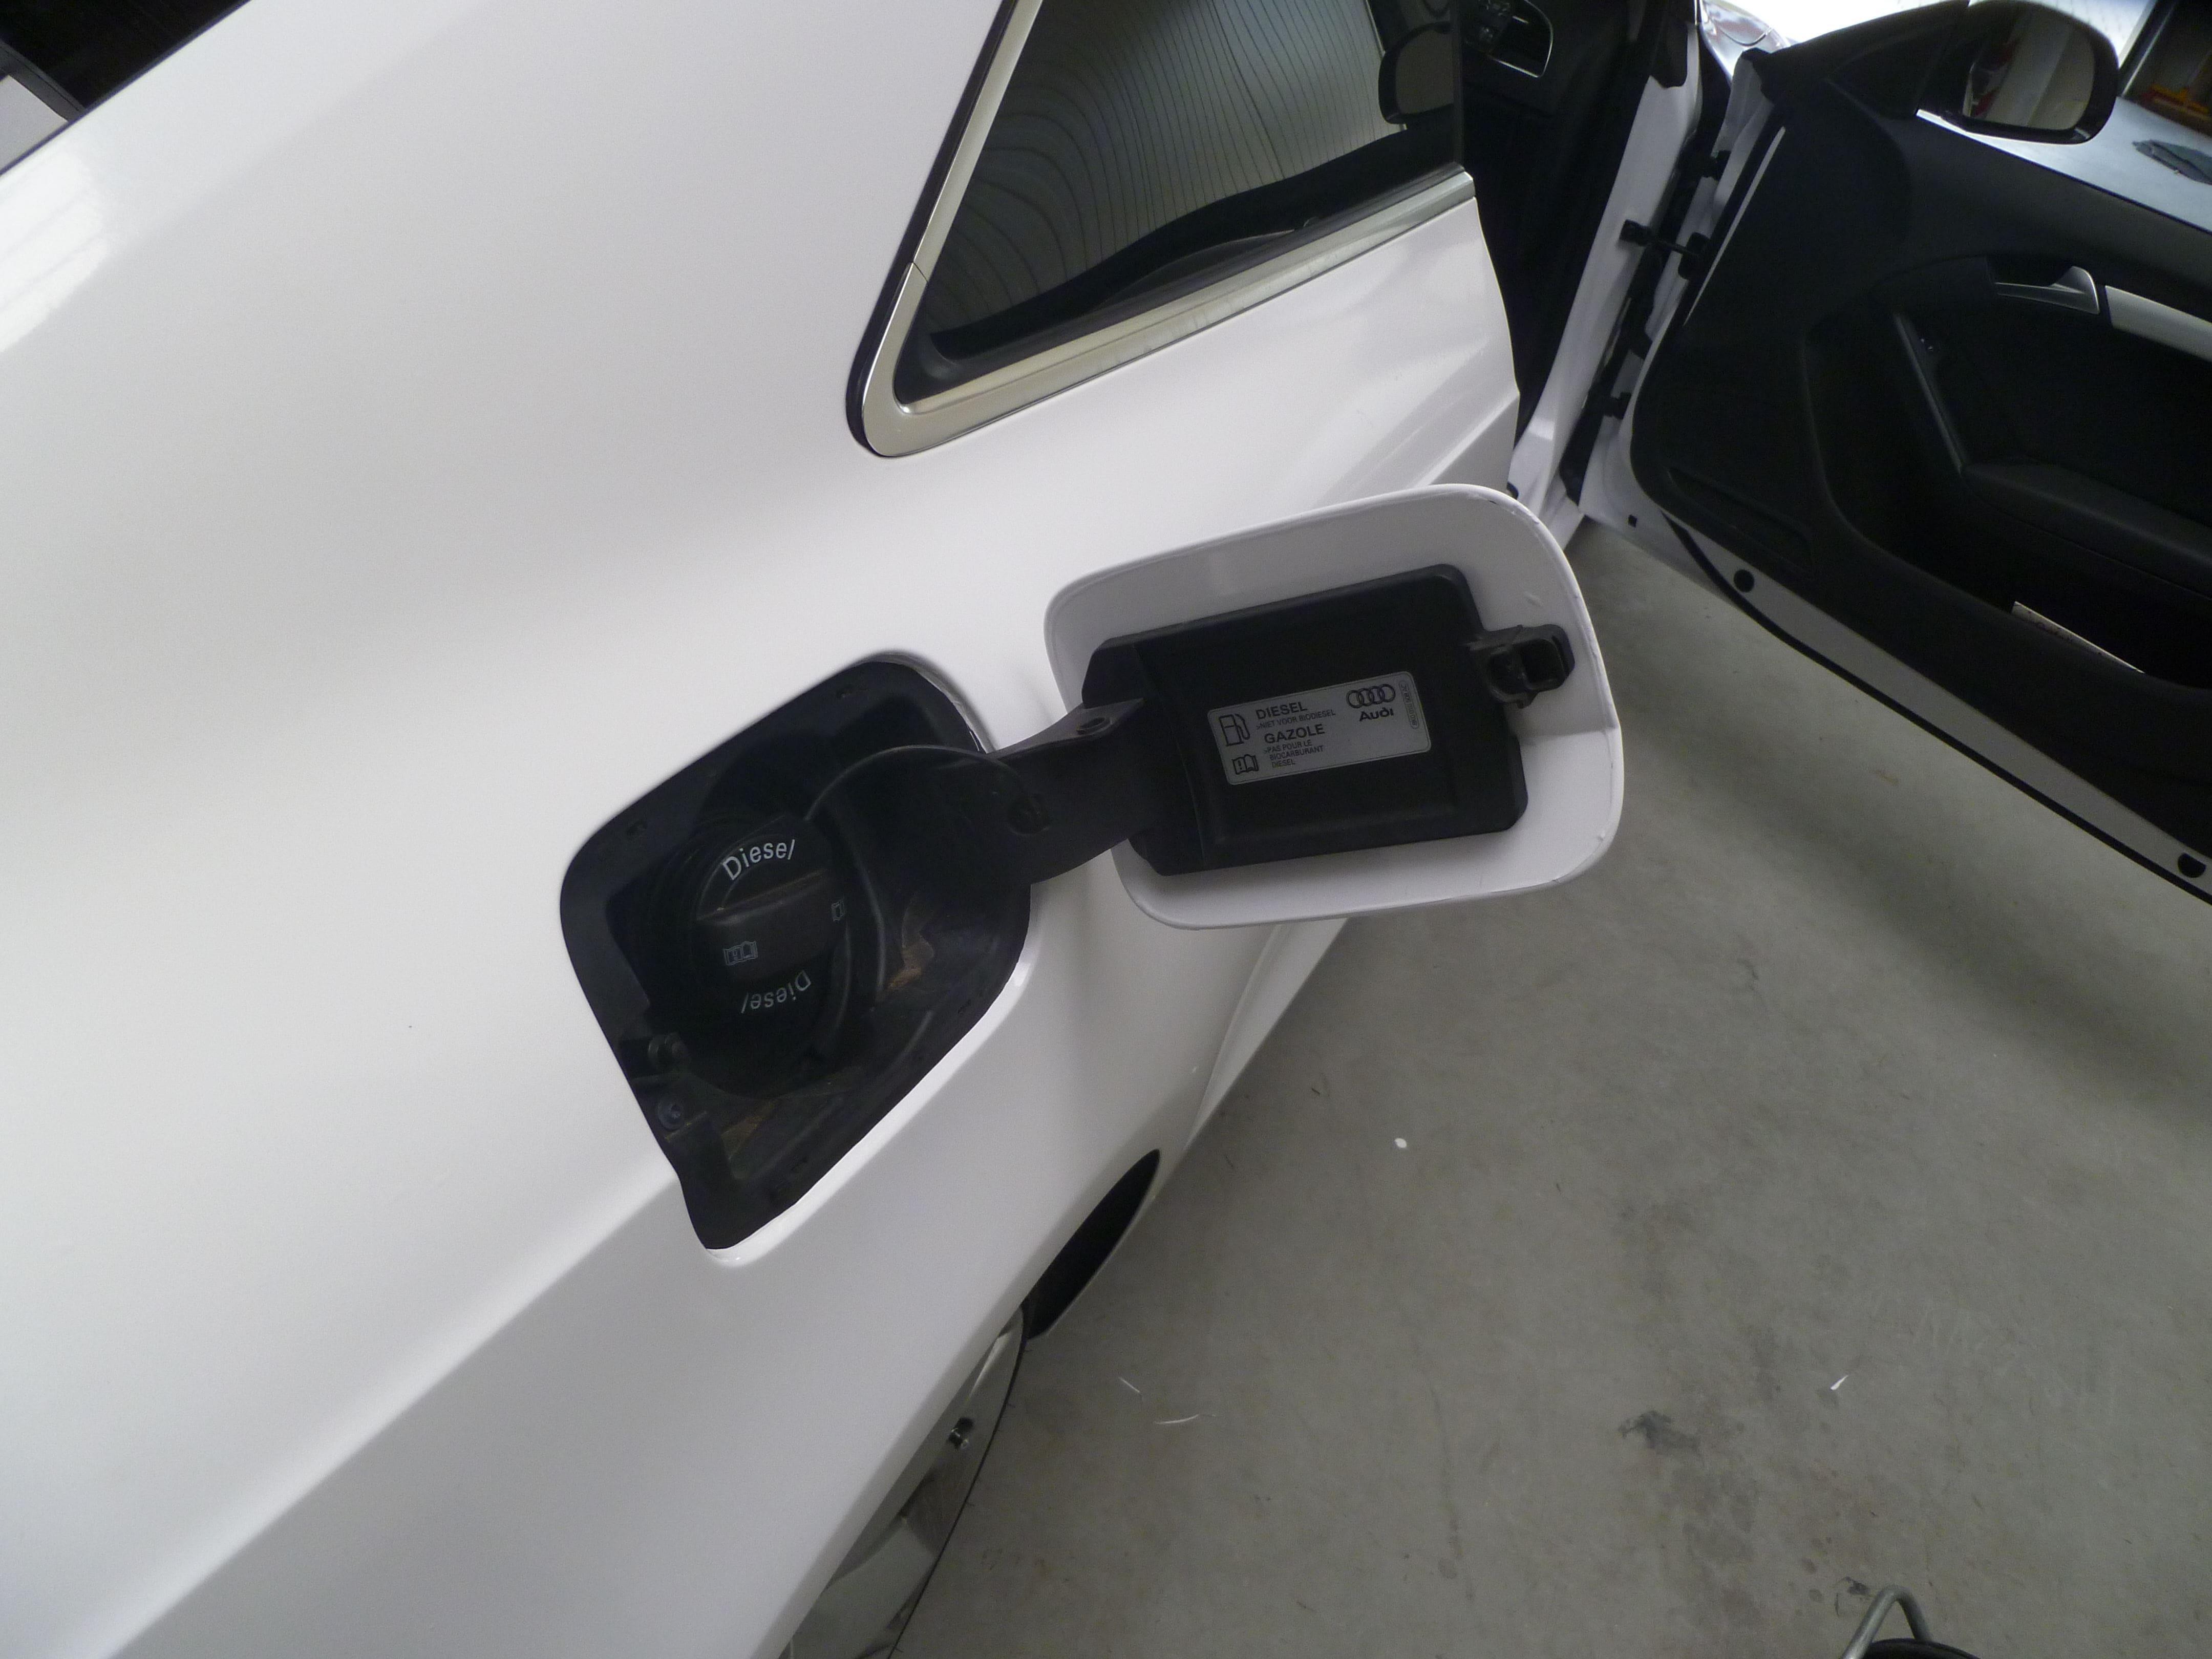 Audi A5 coupe met Metallic Witte Wrap, Carwrapping door Wrapmyride.nu Foto-nr:4732, ©2021